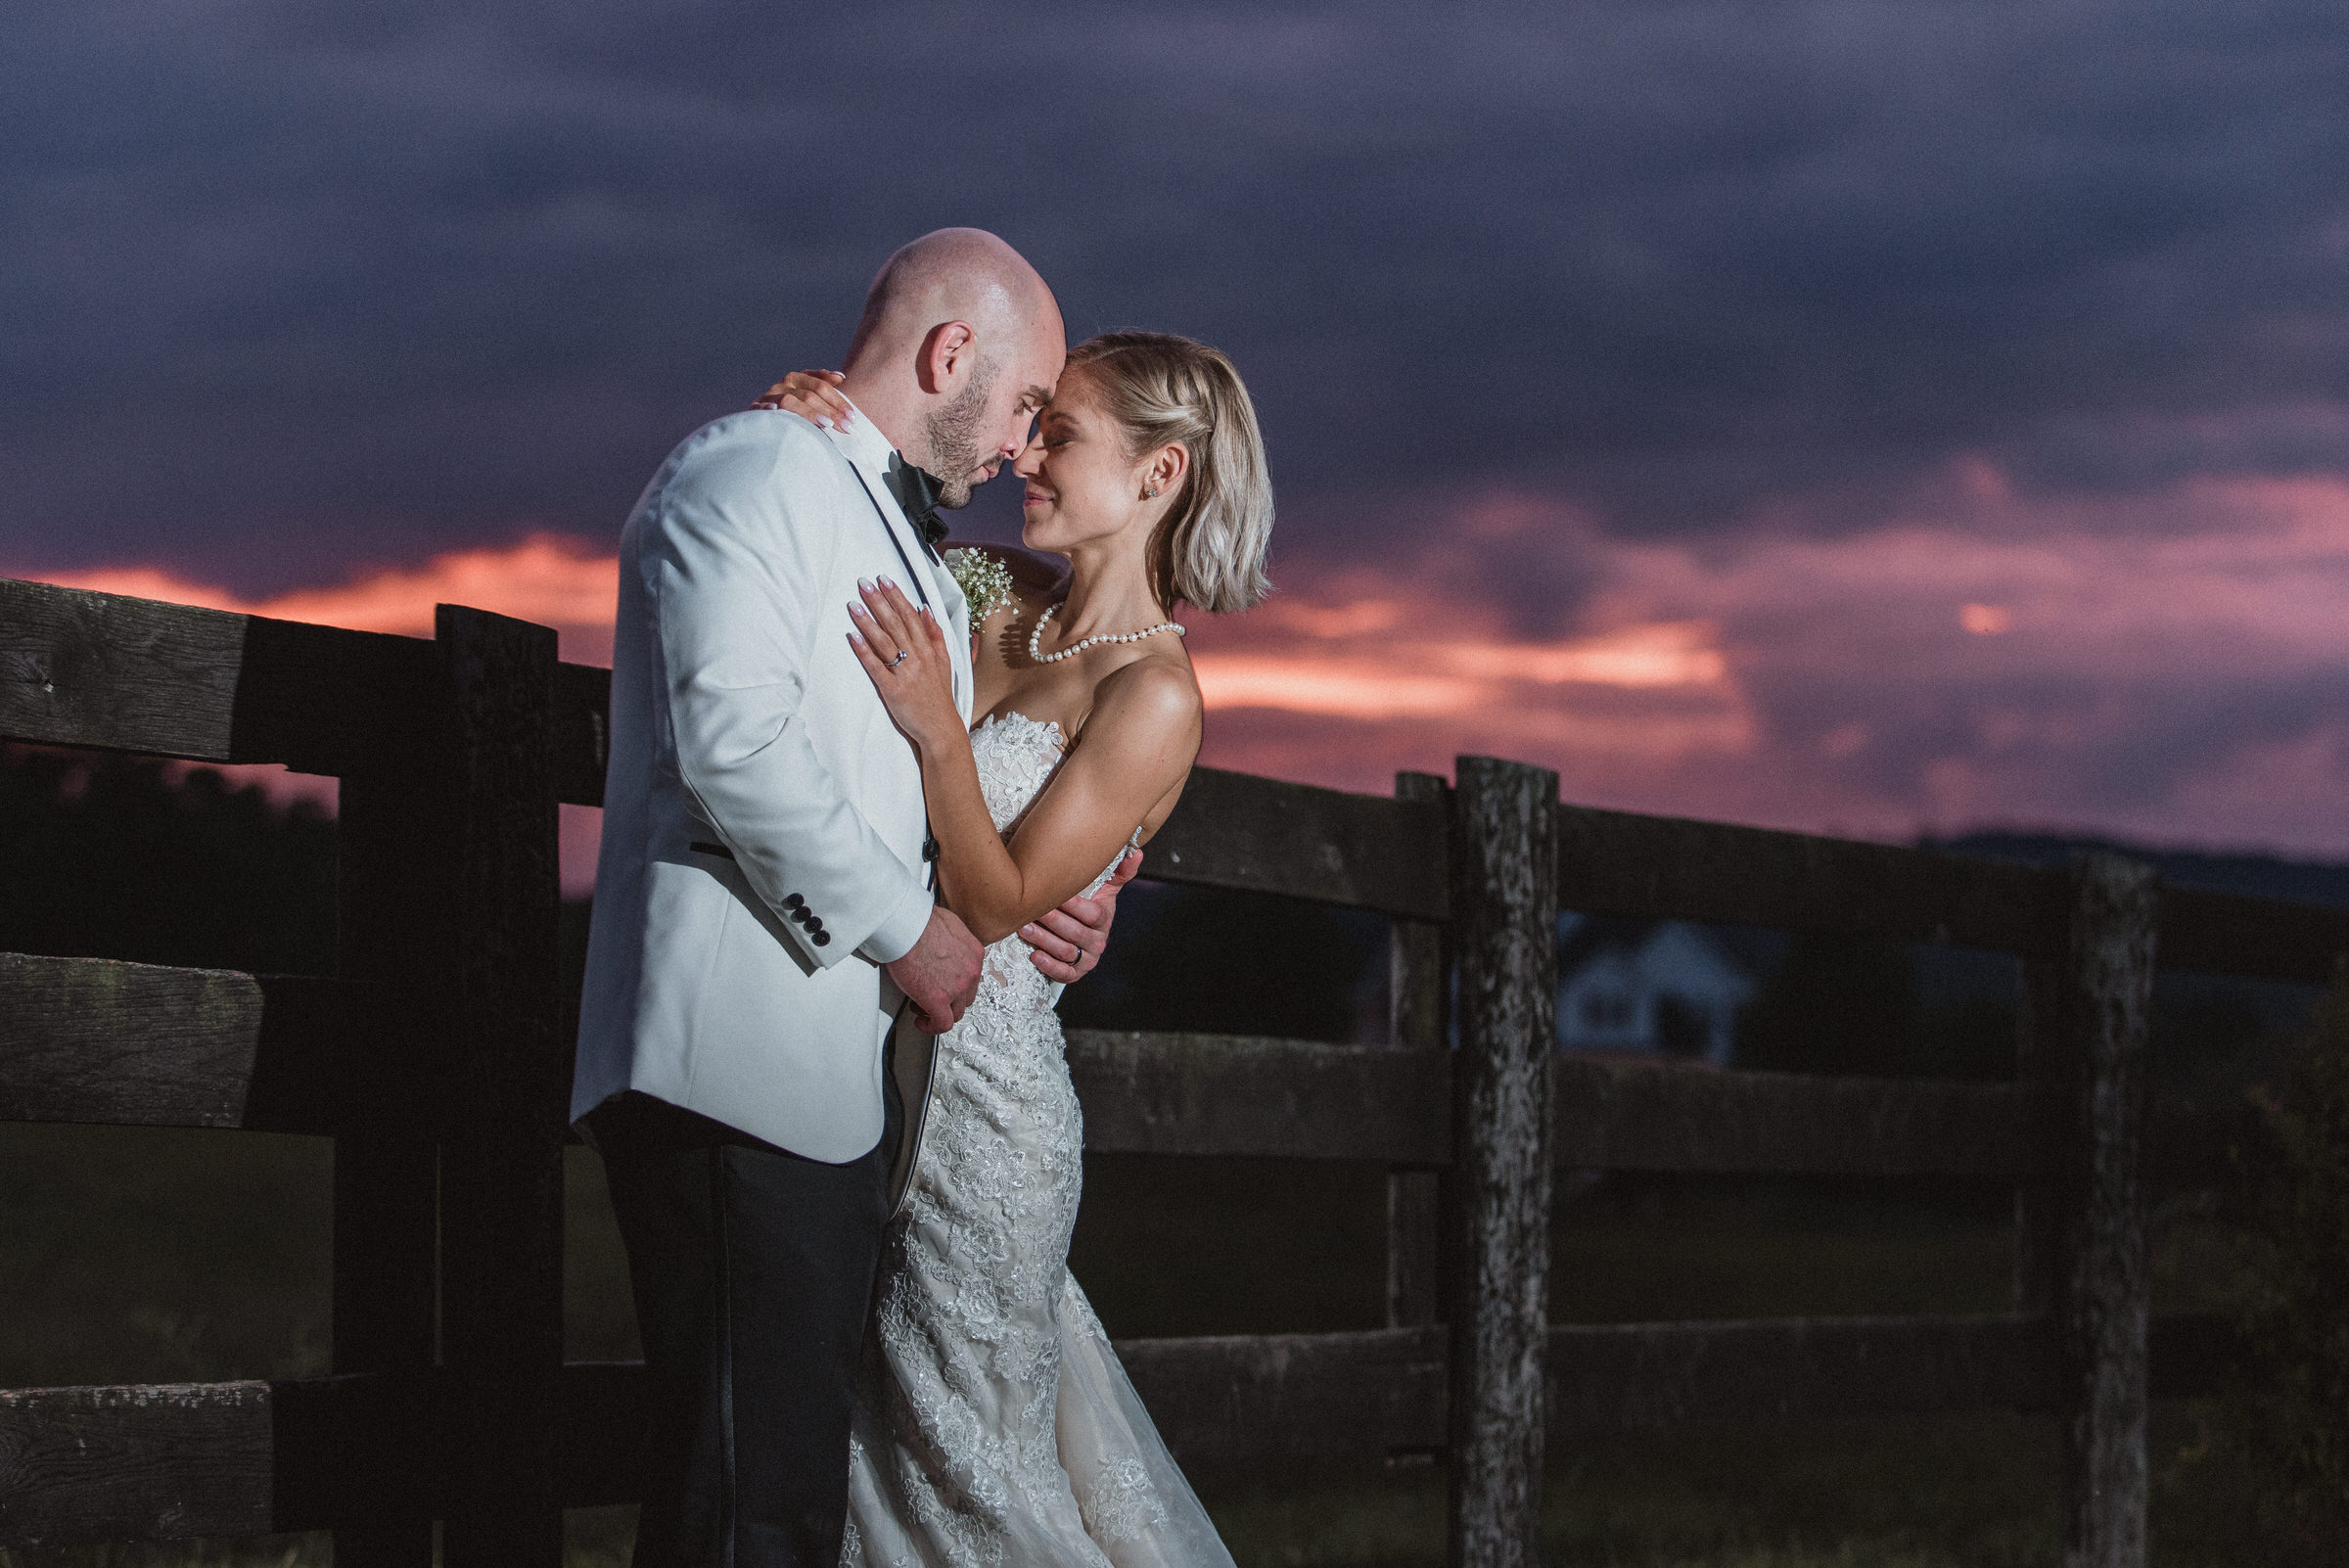 102-Leesburg-Barn-Wedding-Portraits-Sunset